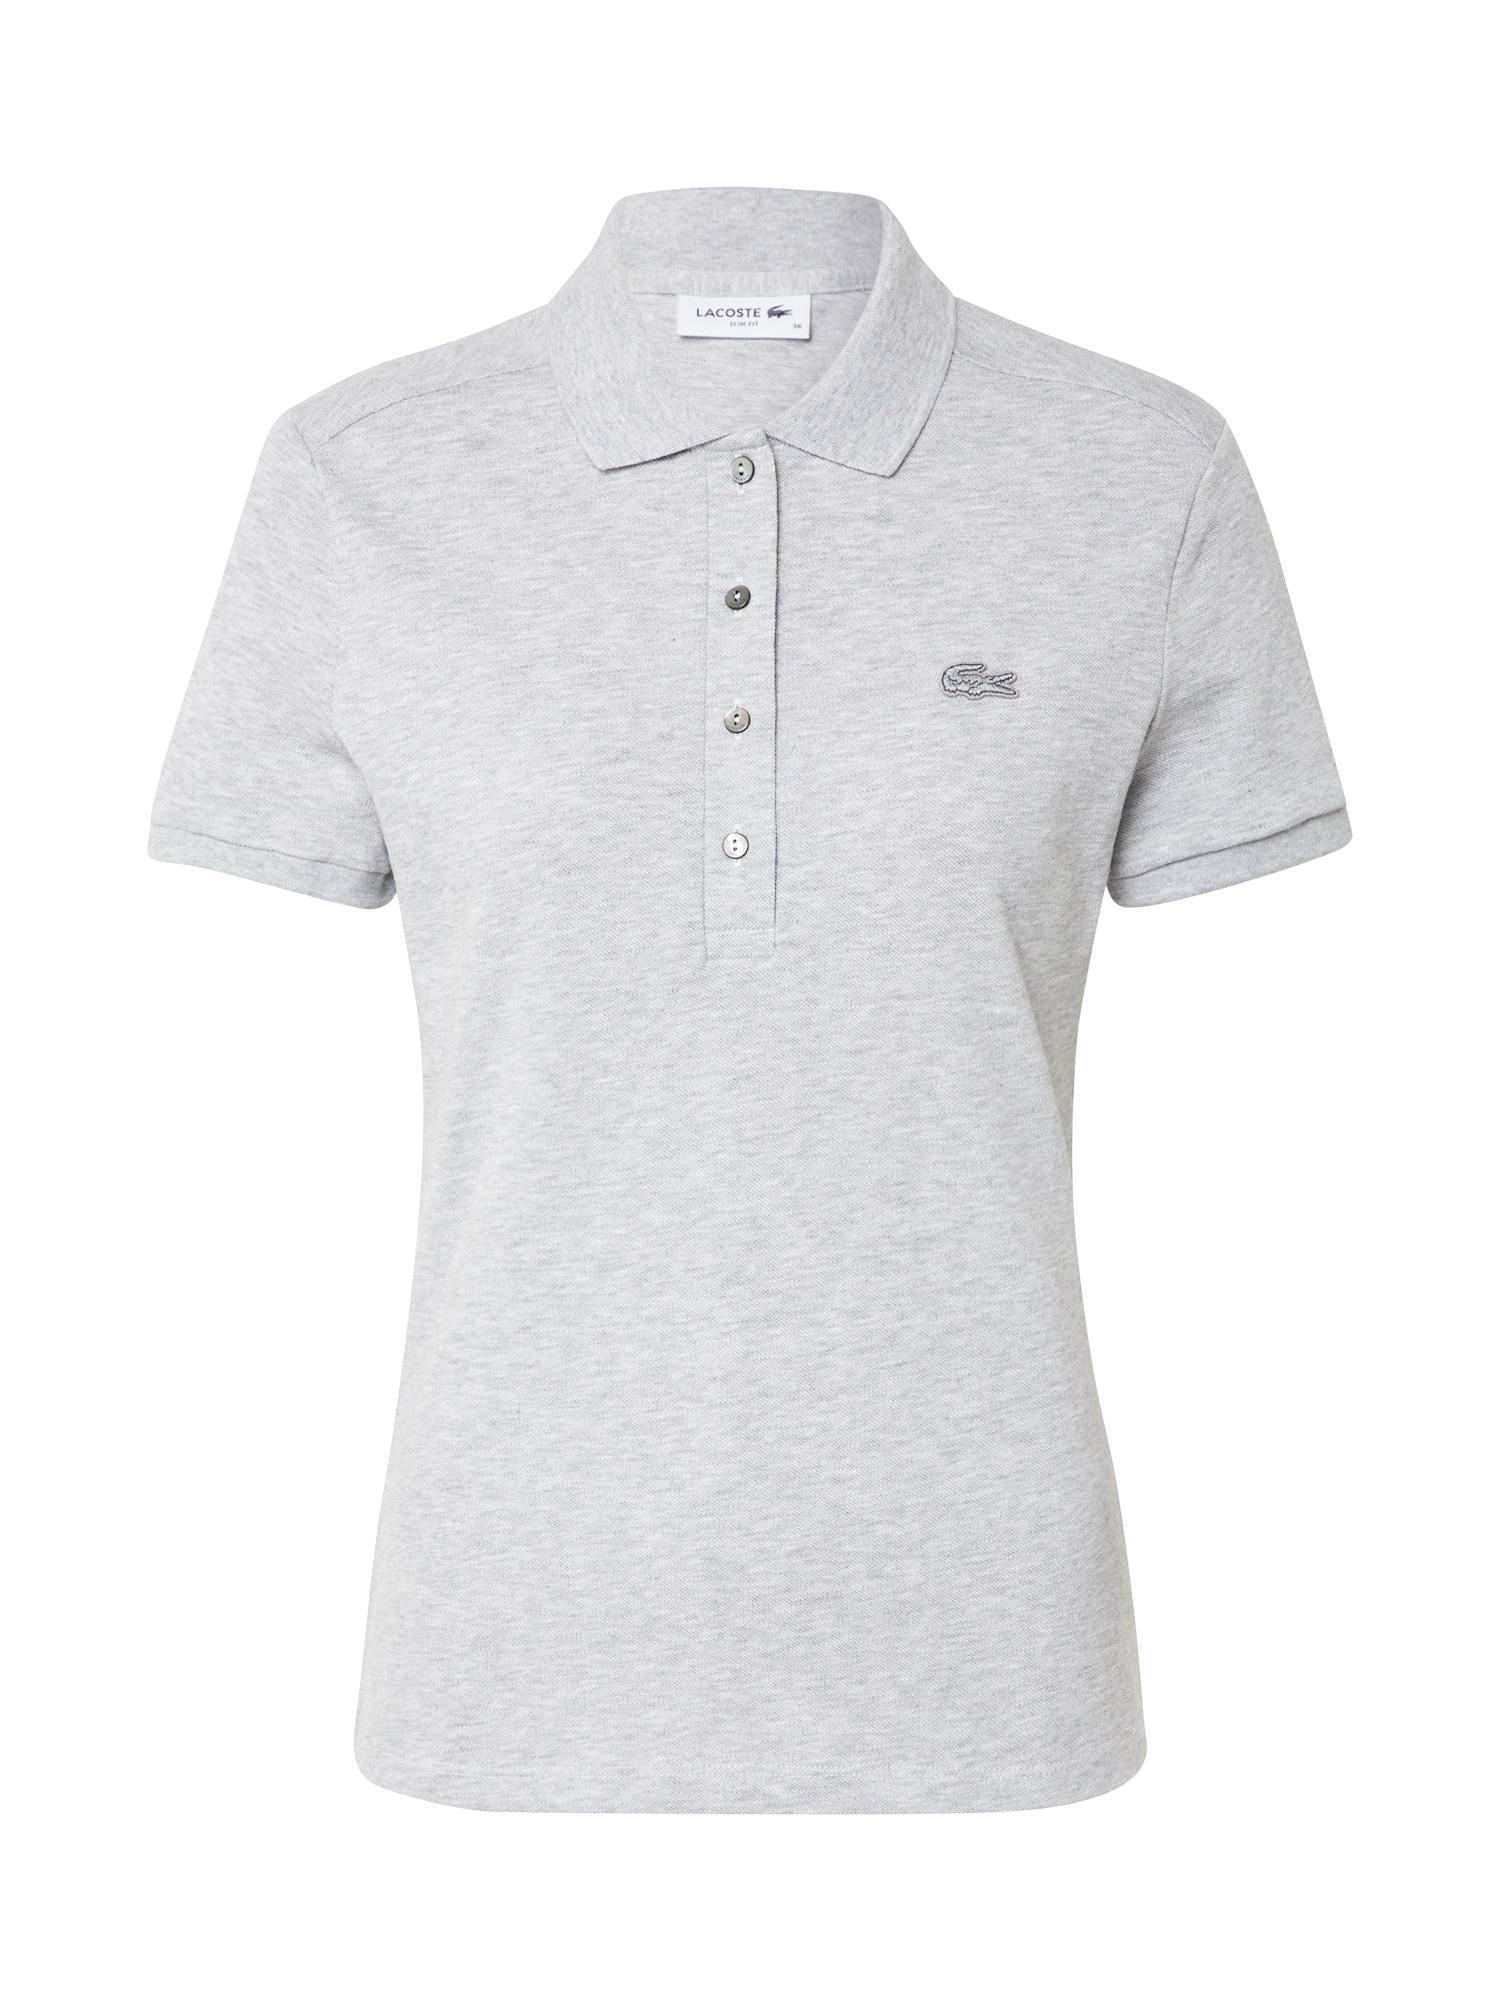 LACOSTE Marškinėliai 'CHEMISE COL BORD-COTES MA' sidabro pilka / tamsiai pilka